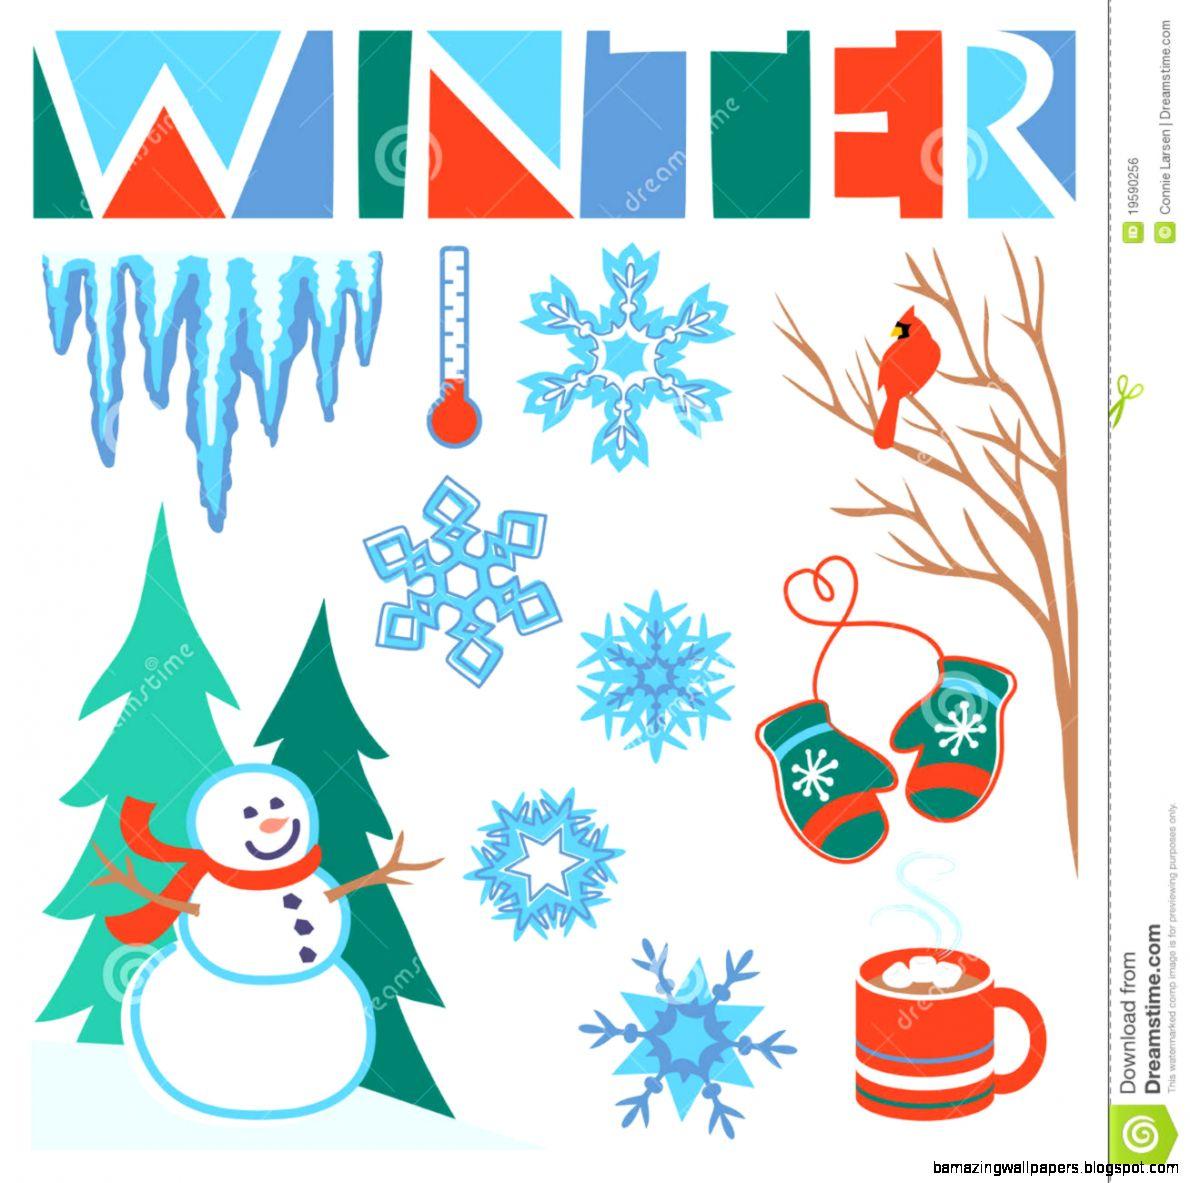 Winter Clip Art Seteps Royalty Free Stock Image   Image 19590256